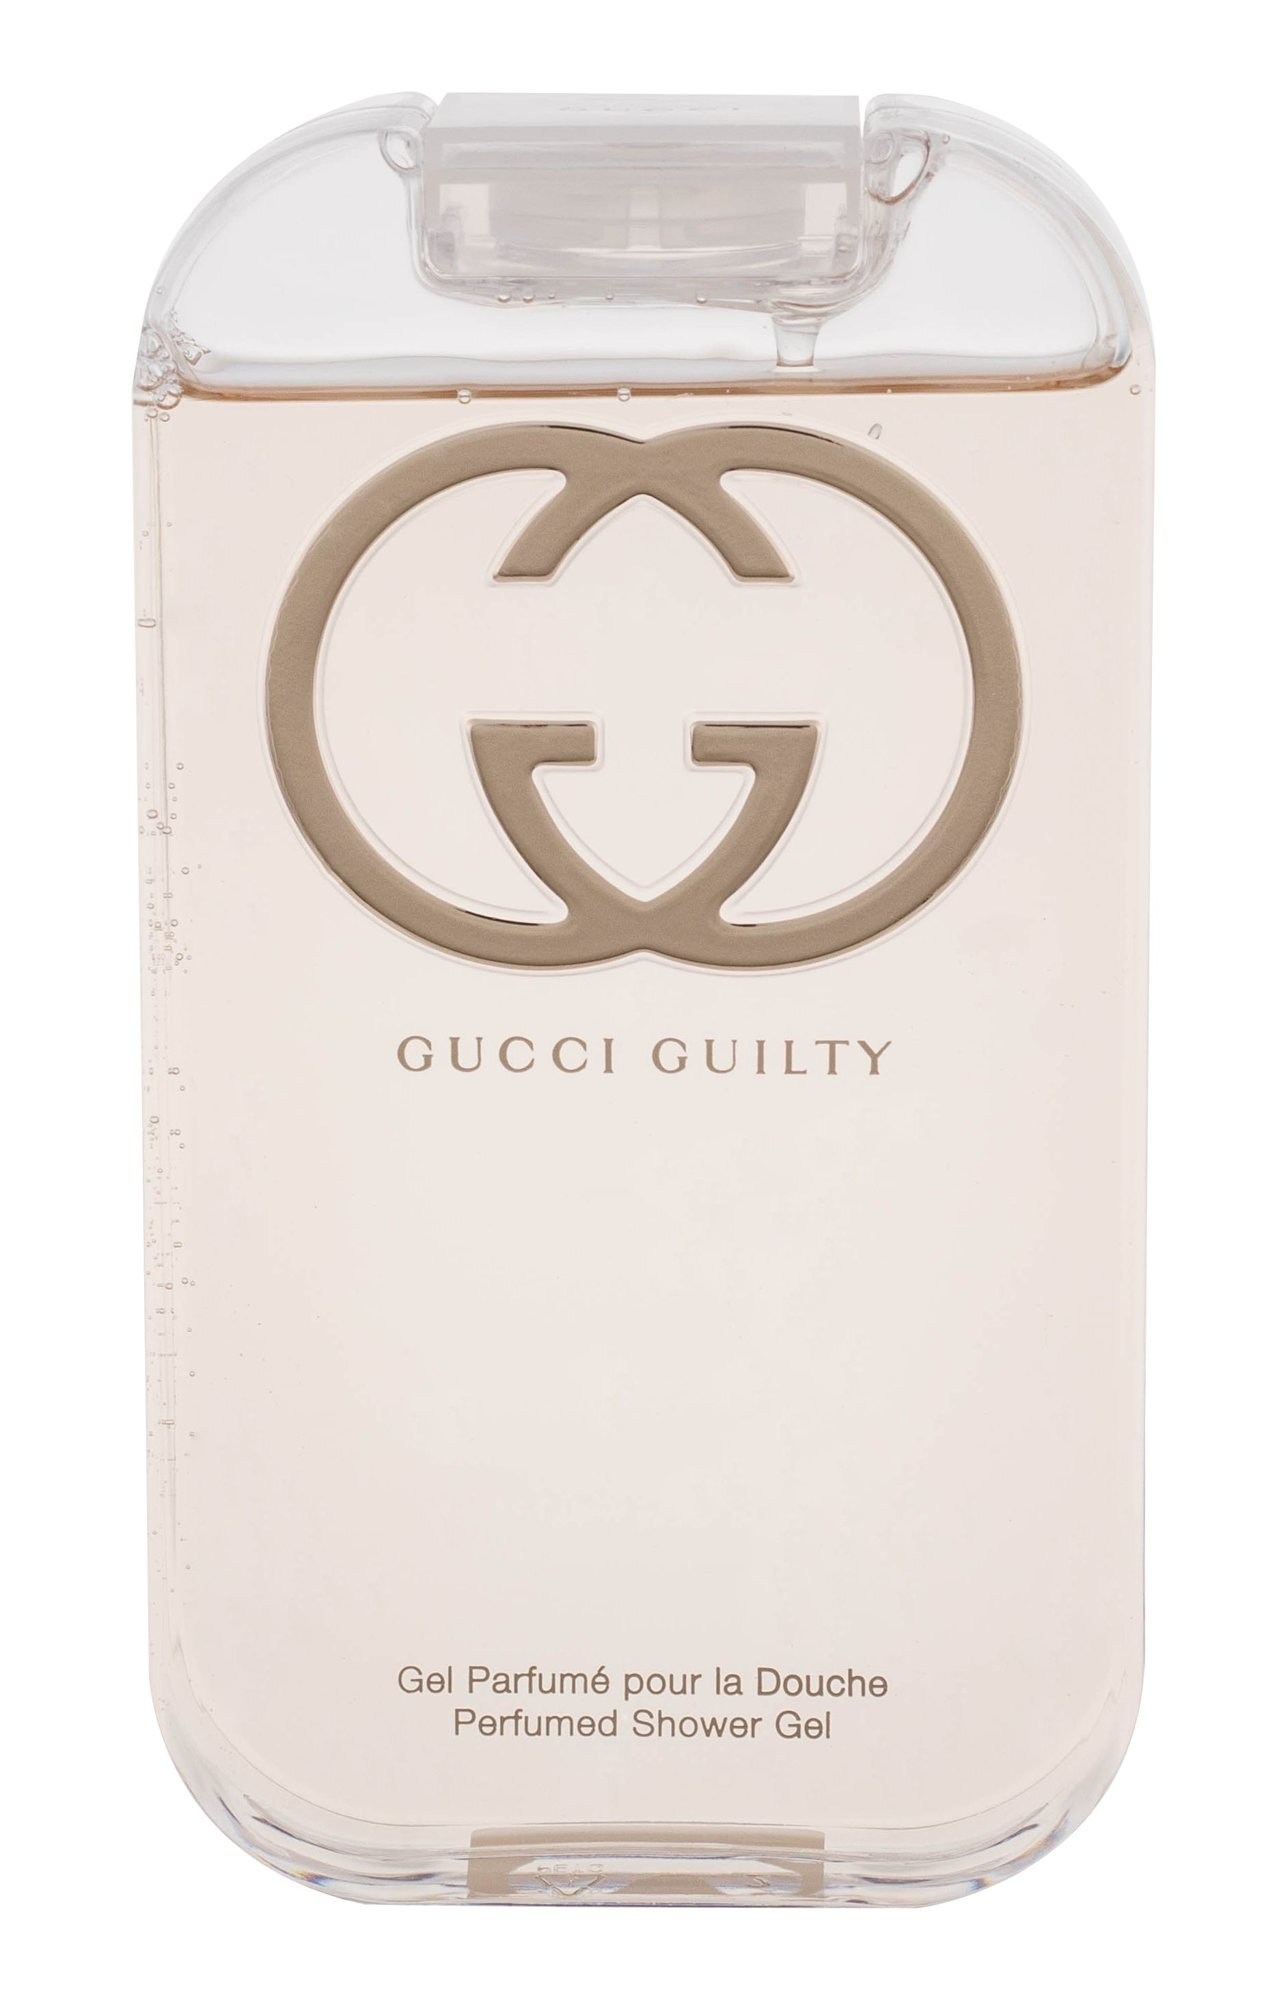 Gucci Guilty Shower gel 200ml